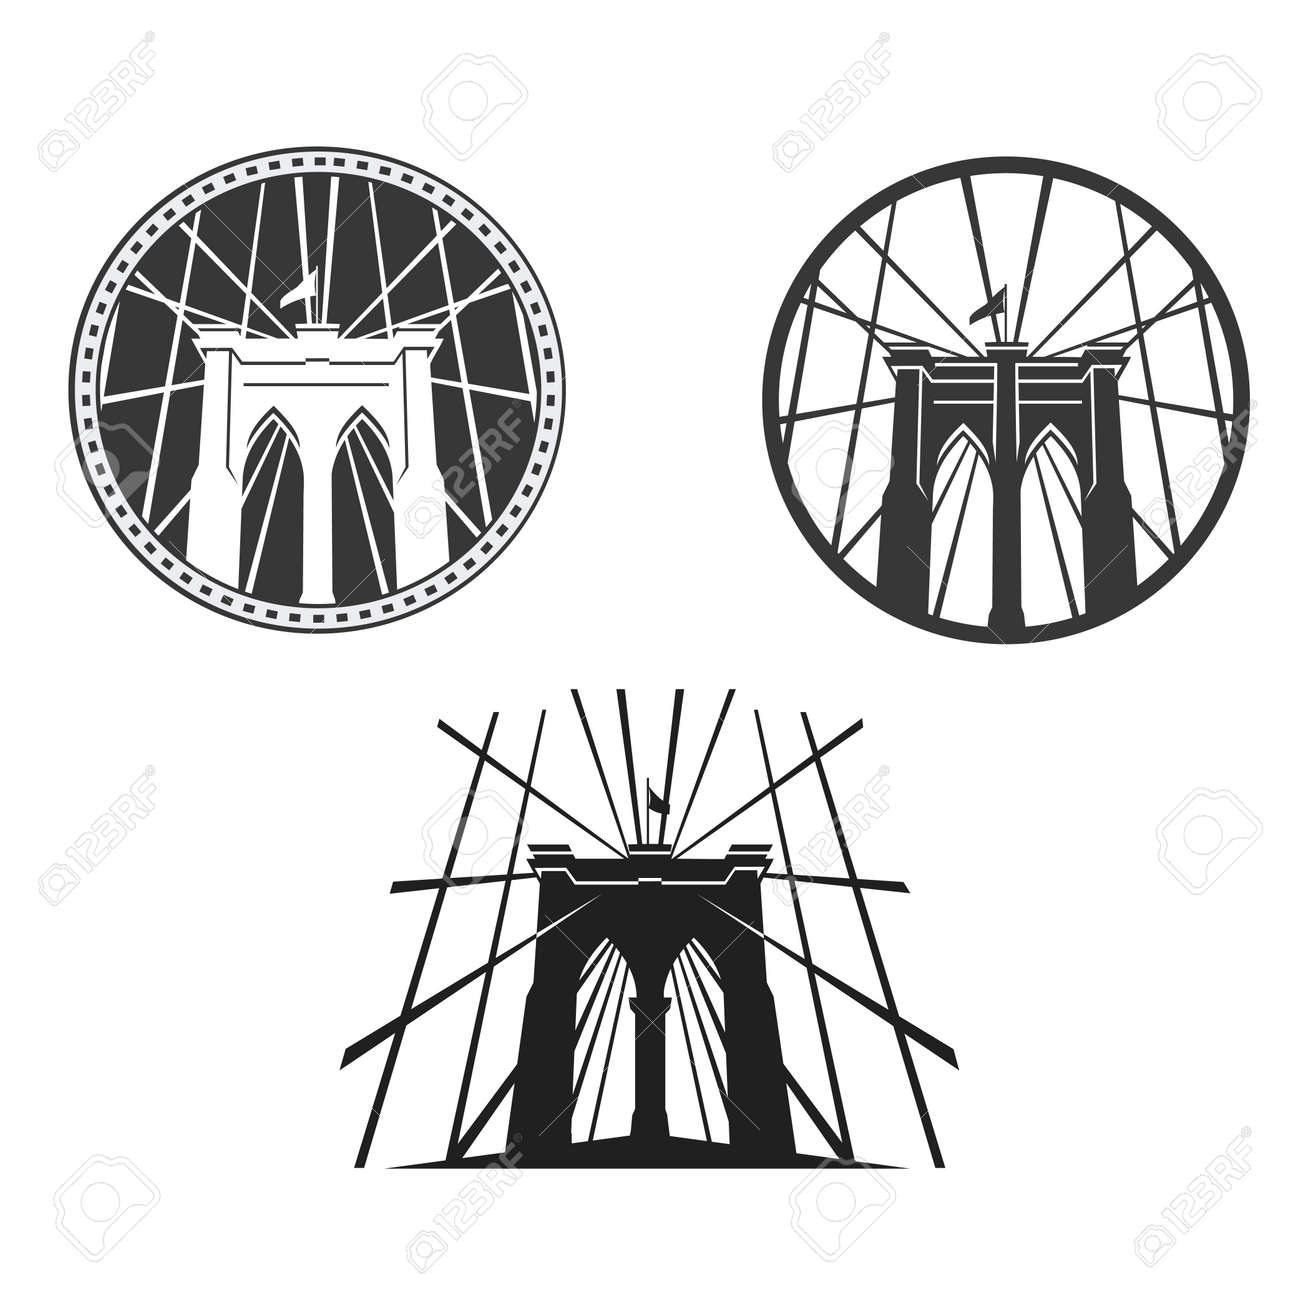 686 brooklyn bridge cliparts stock vector and royalty free brooklyn rh 123rf com brooklyn bridge vector image brooklyn bridge vector